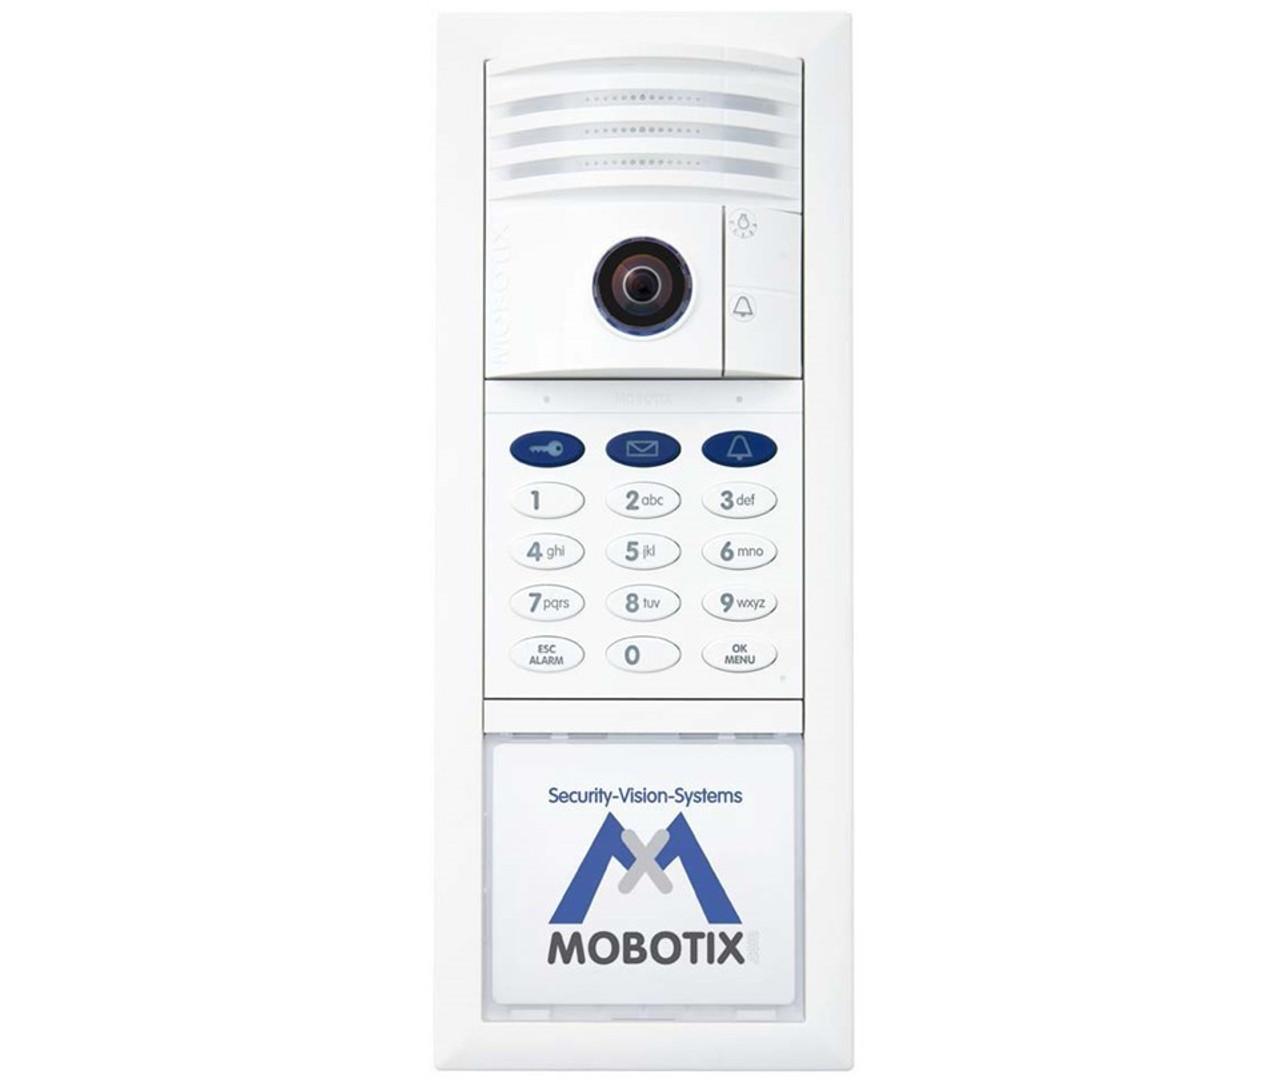 Mobotix MX-T25-SET1 6MP Indoor/Outdoor Complete Kit IP Video Door Station -  1 6mm Fixed Lens, Day, vPTZ, Ethernet, Keypad RFID, Weatherproof, White